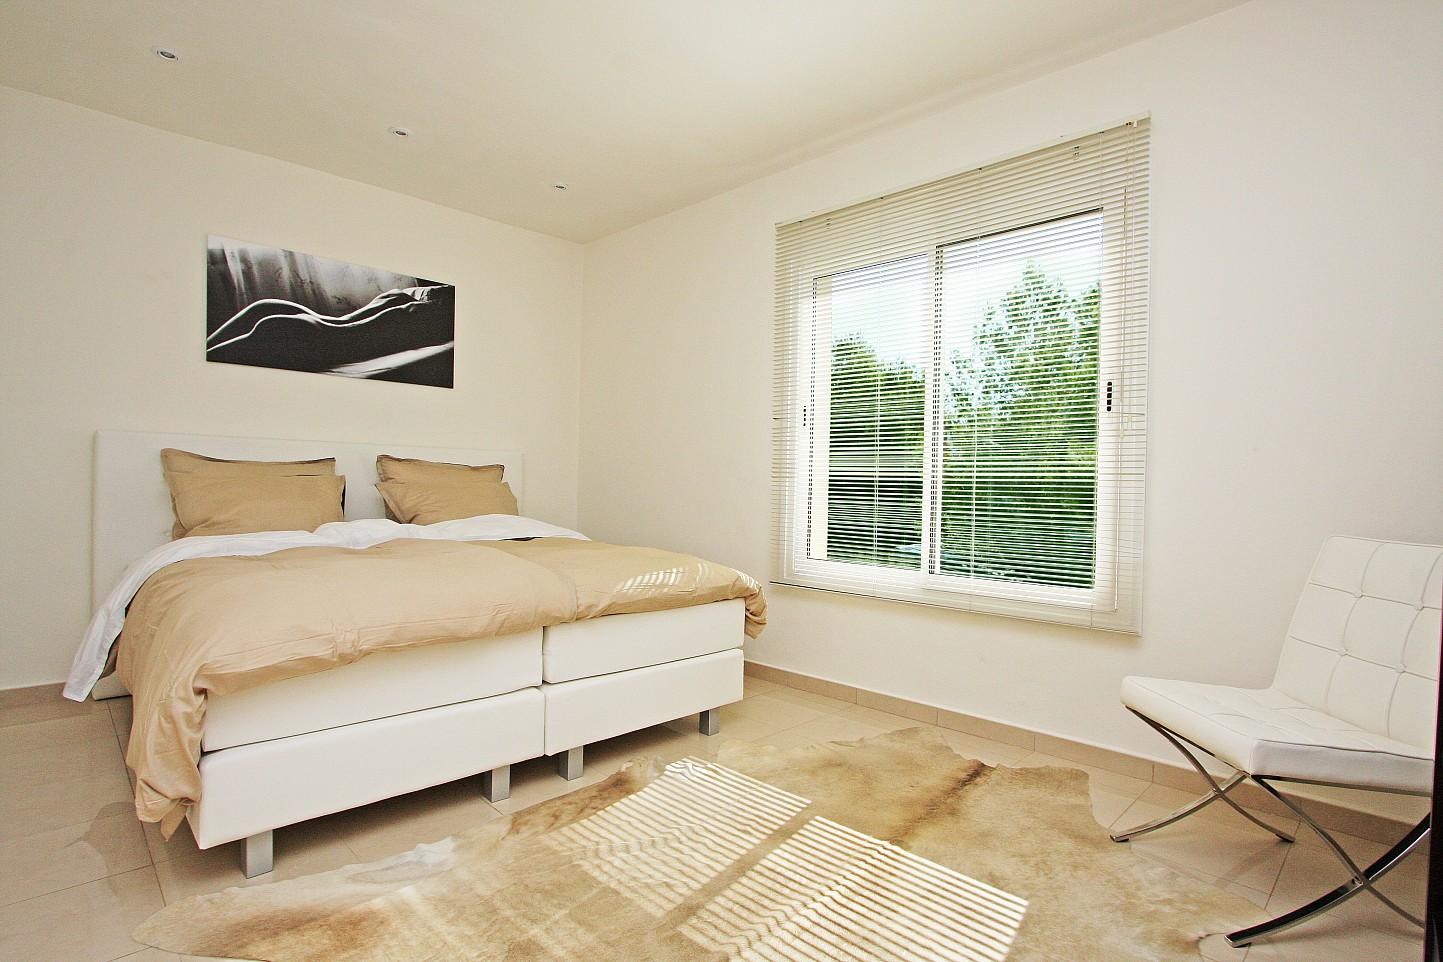 Dormitorio amplio